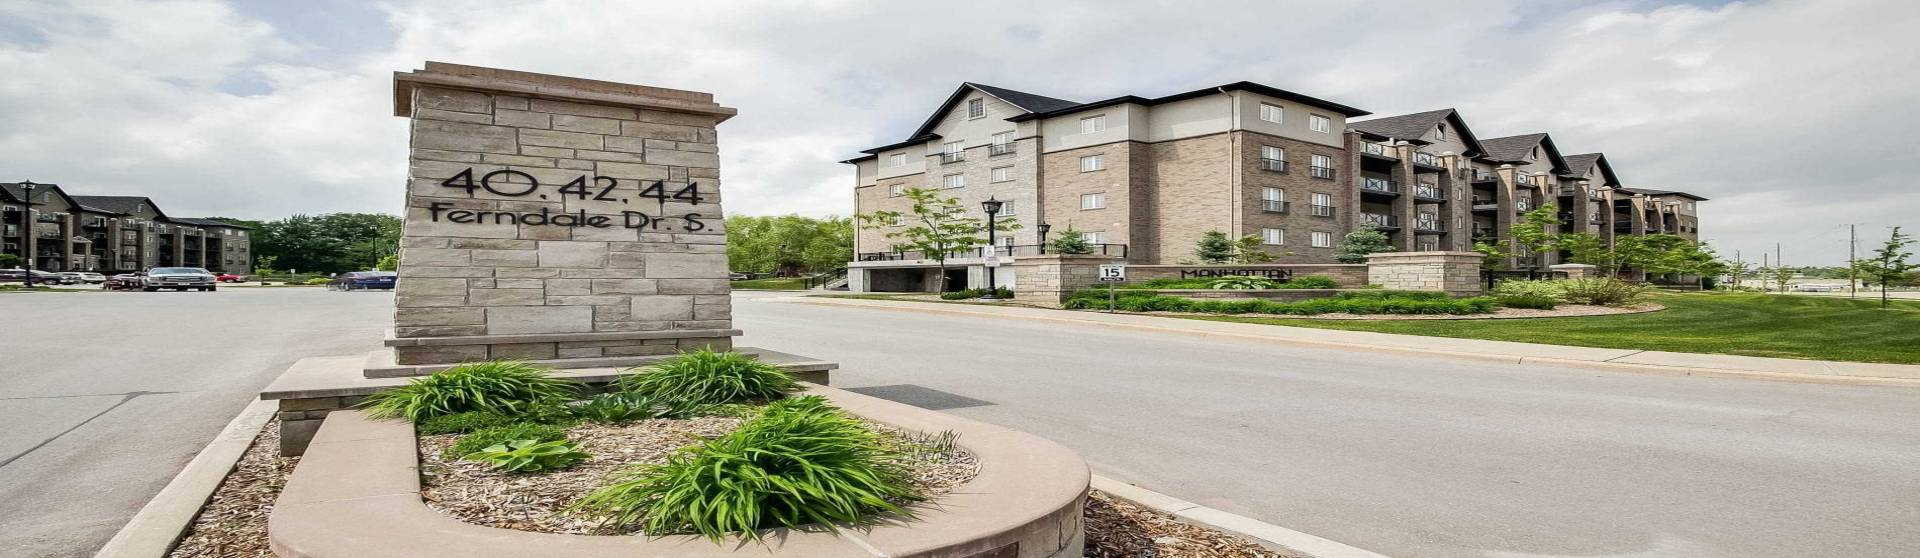 40 Ferndale Dr, Barrie, Ontario L4N 2L3, 3 Bedrooms Bedrooms, 6 Rooms Rooms,2 BathroomsBathrooms,Condo Apt,Sale,Ferndale,S4791560